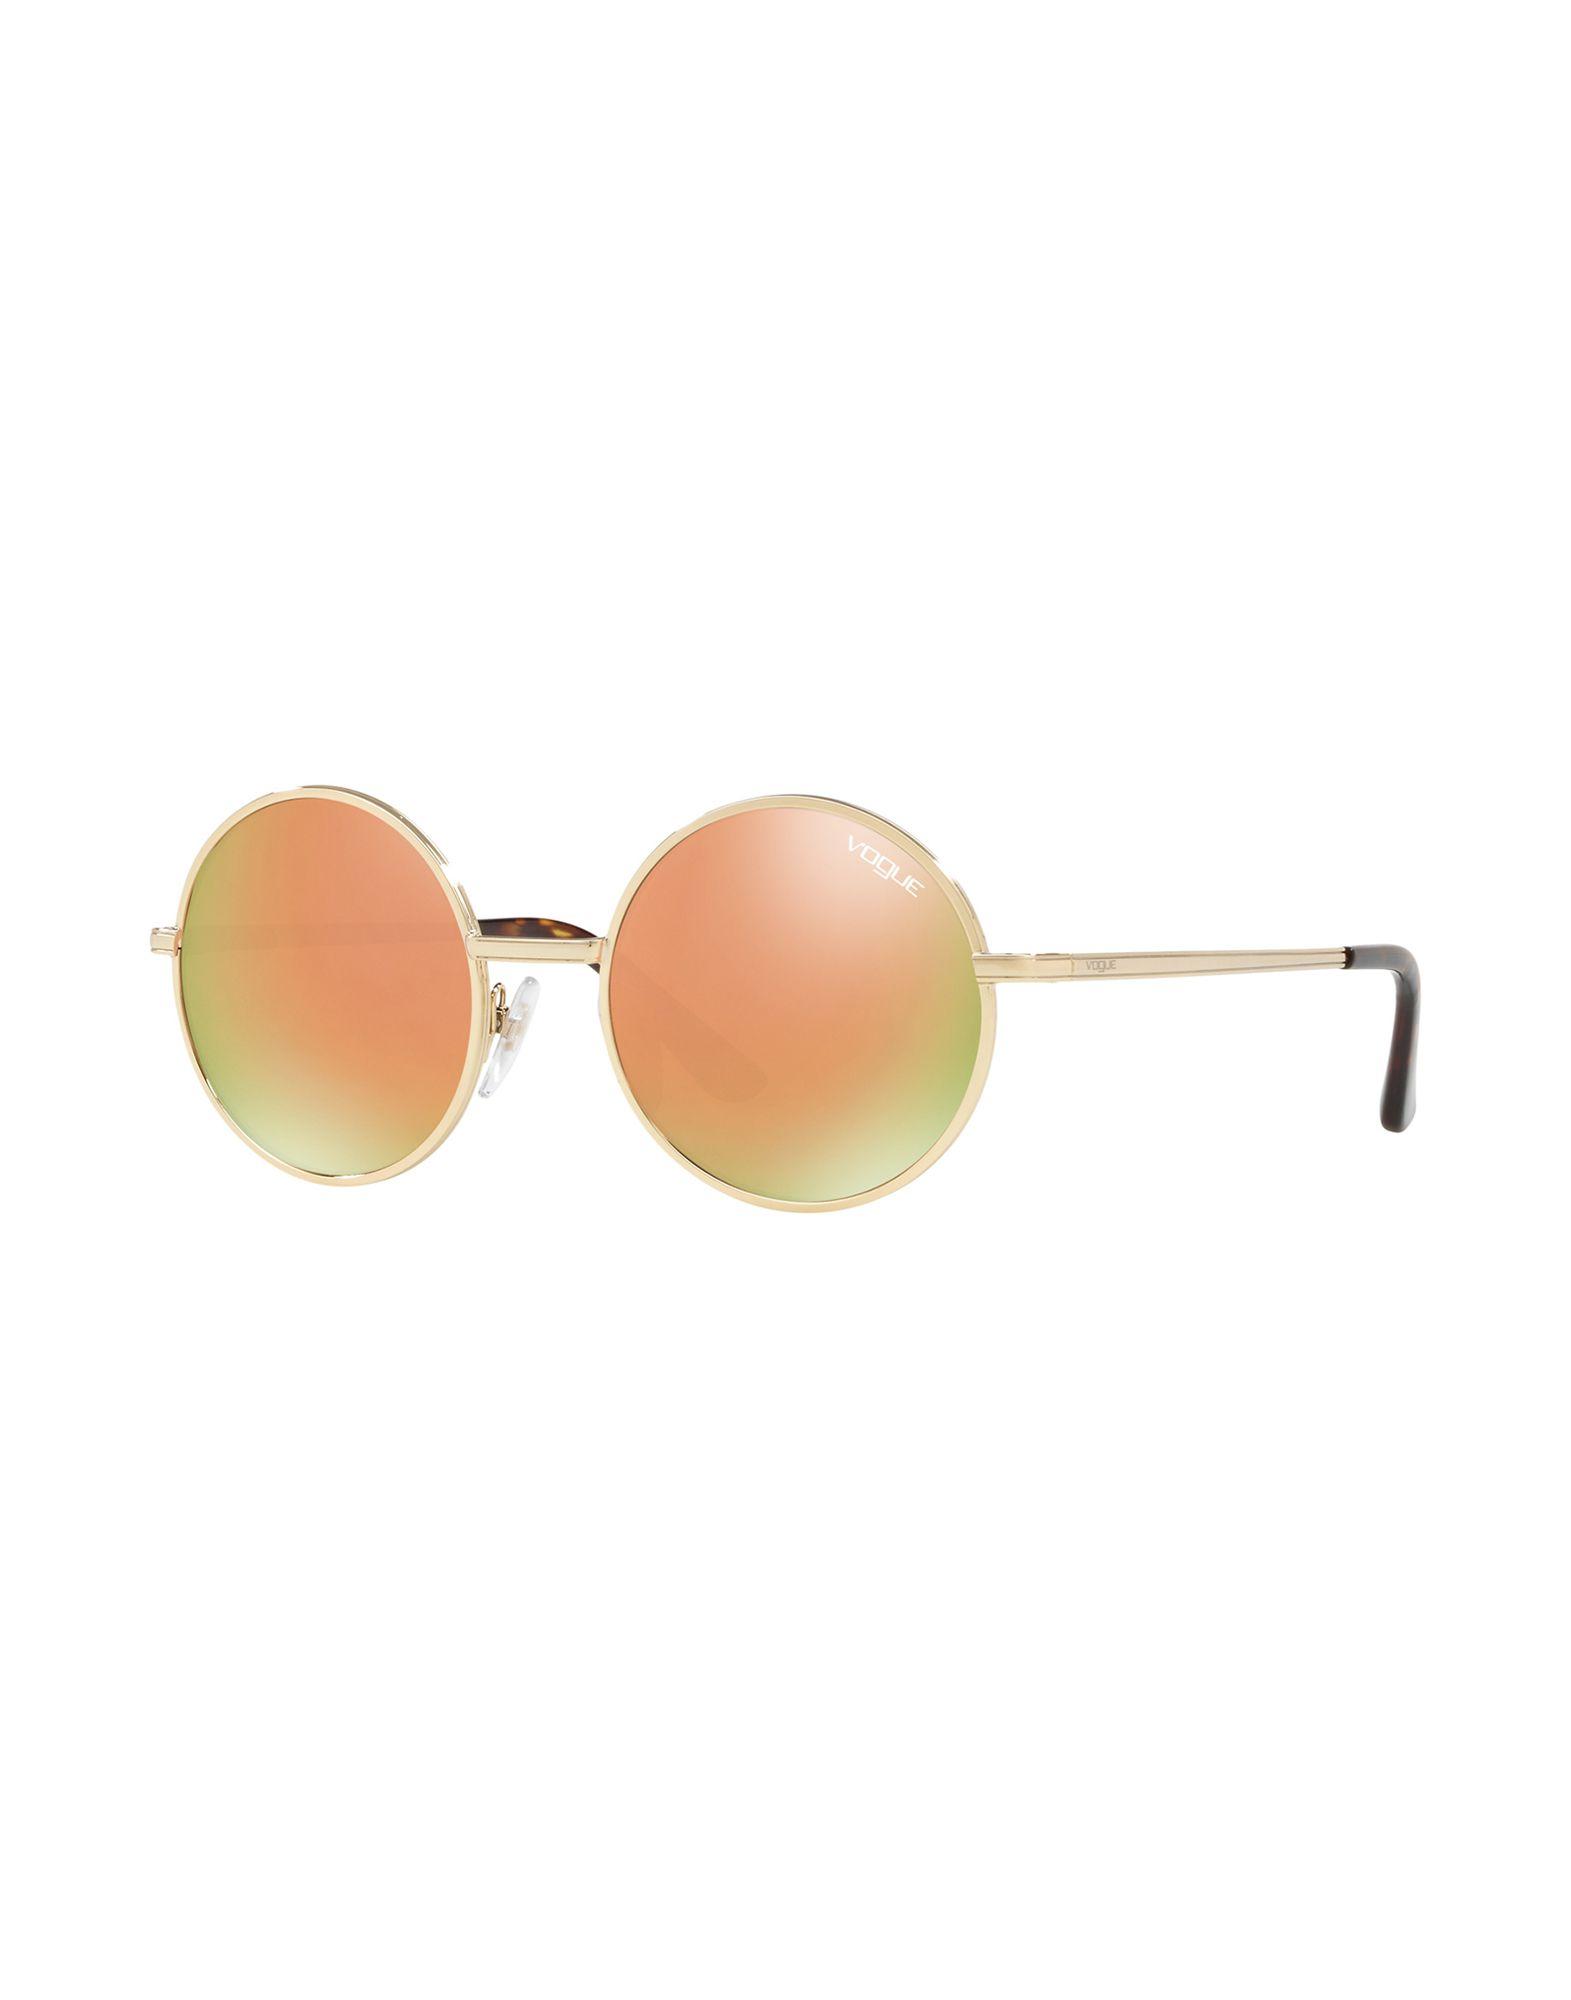 e93fc9bca6 Γυαλιά Ηλίου Gigi Hadid For Vogue Vo4085s - Γυναίκα - Γυαλιά Ηλίου Gigi  Hadid For Vogue στο YOOX - 46585670OO